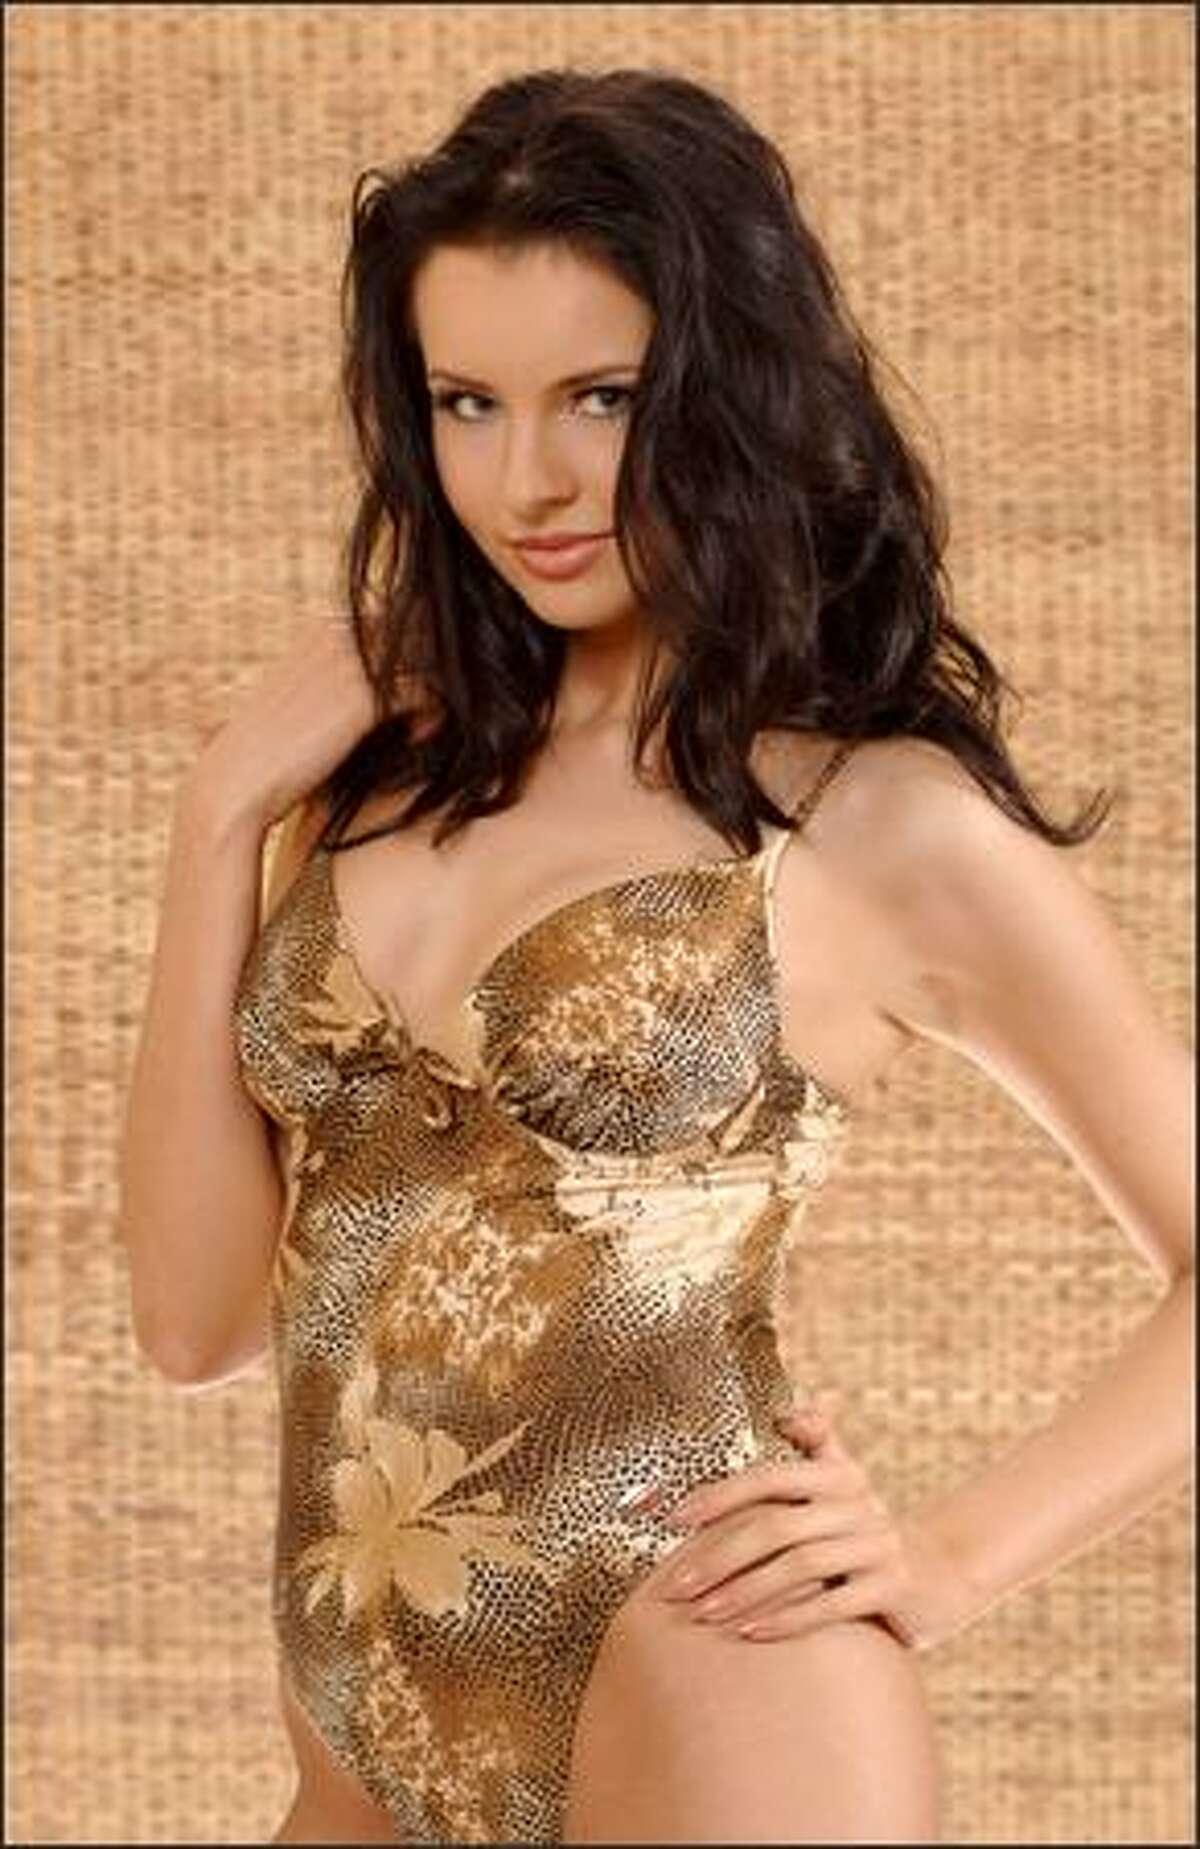 Natalia Nikolaeva, Miss Russia.